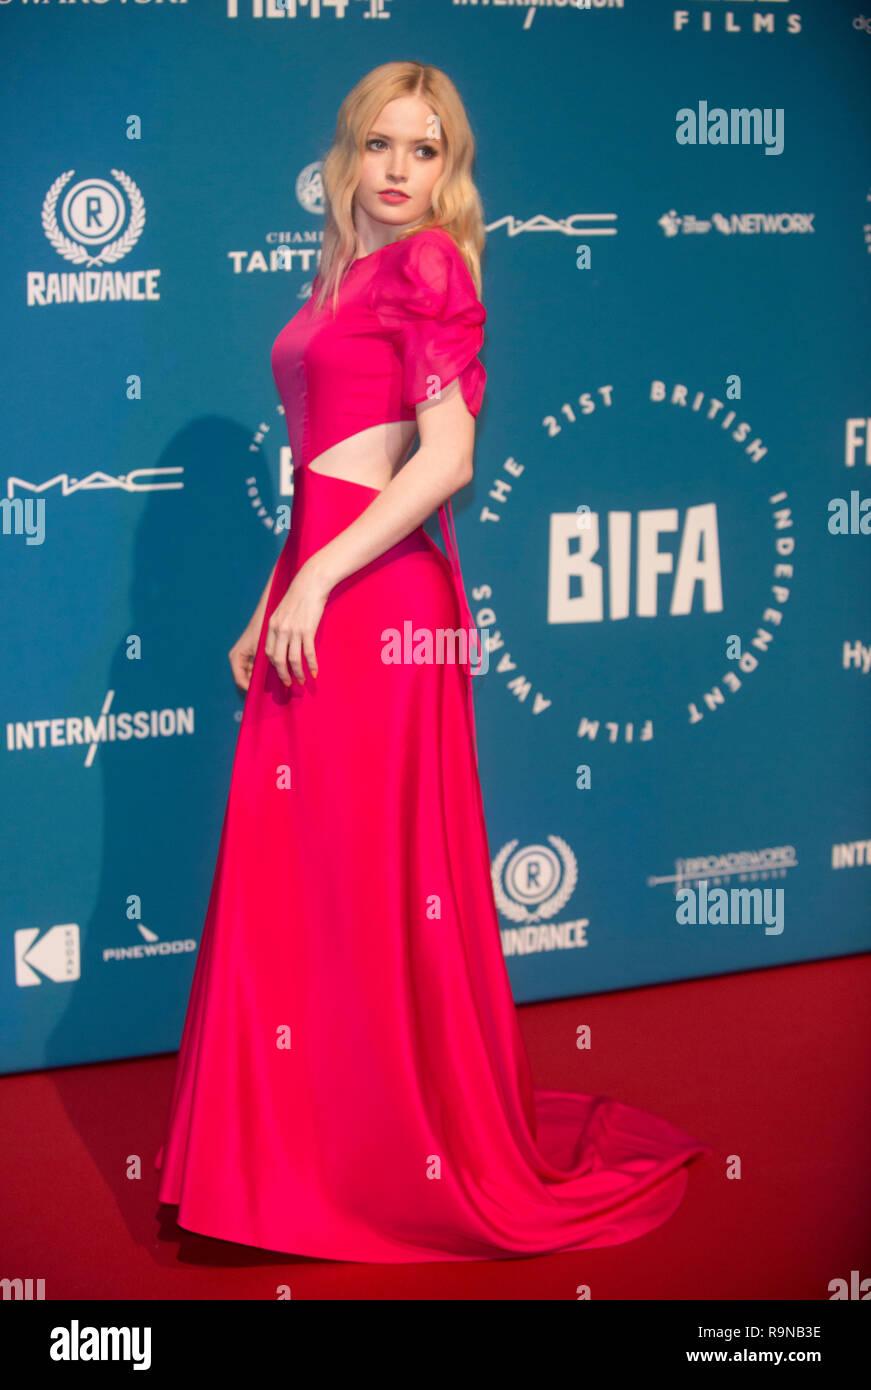 Ellie Bamber at the 21ST BRITISH INDEPENDENT FILM AWARDS  at Old Billingsgate, London, photo by Bran Jordan - Stock Image